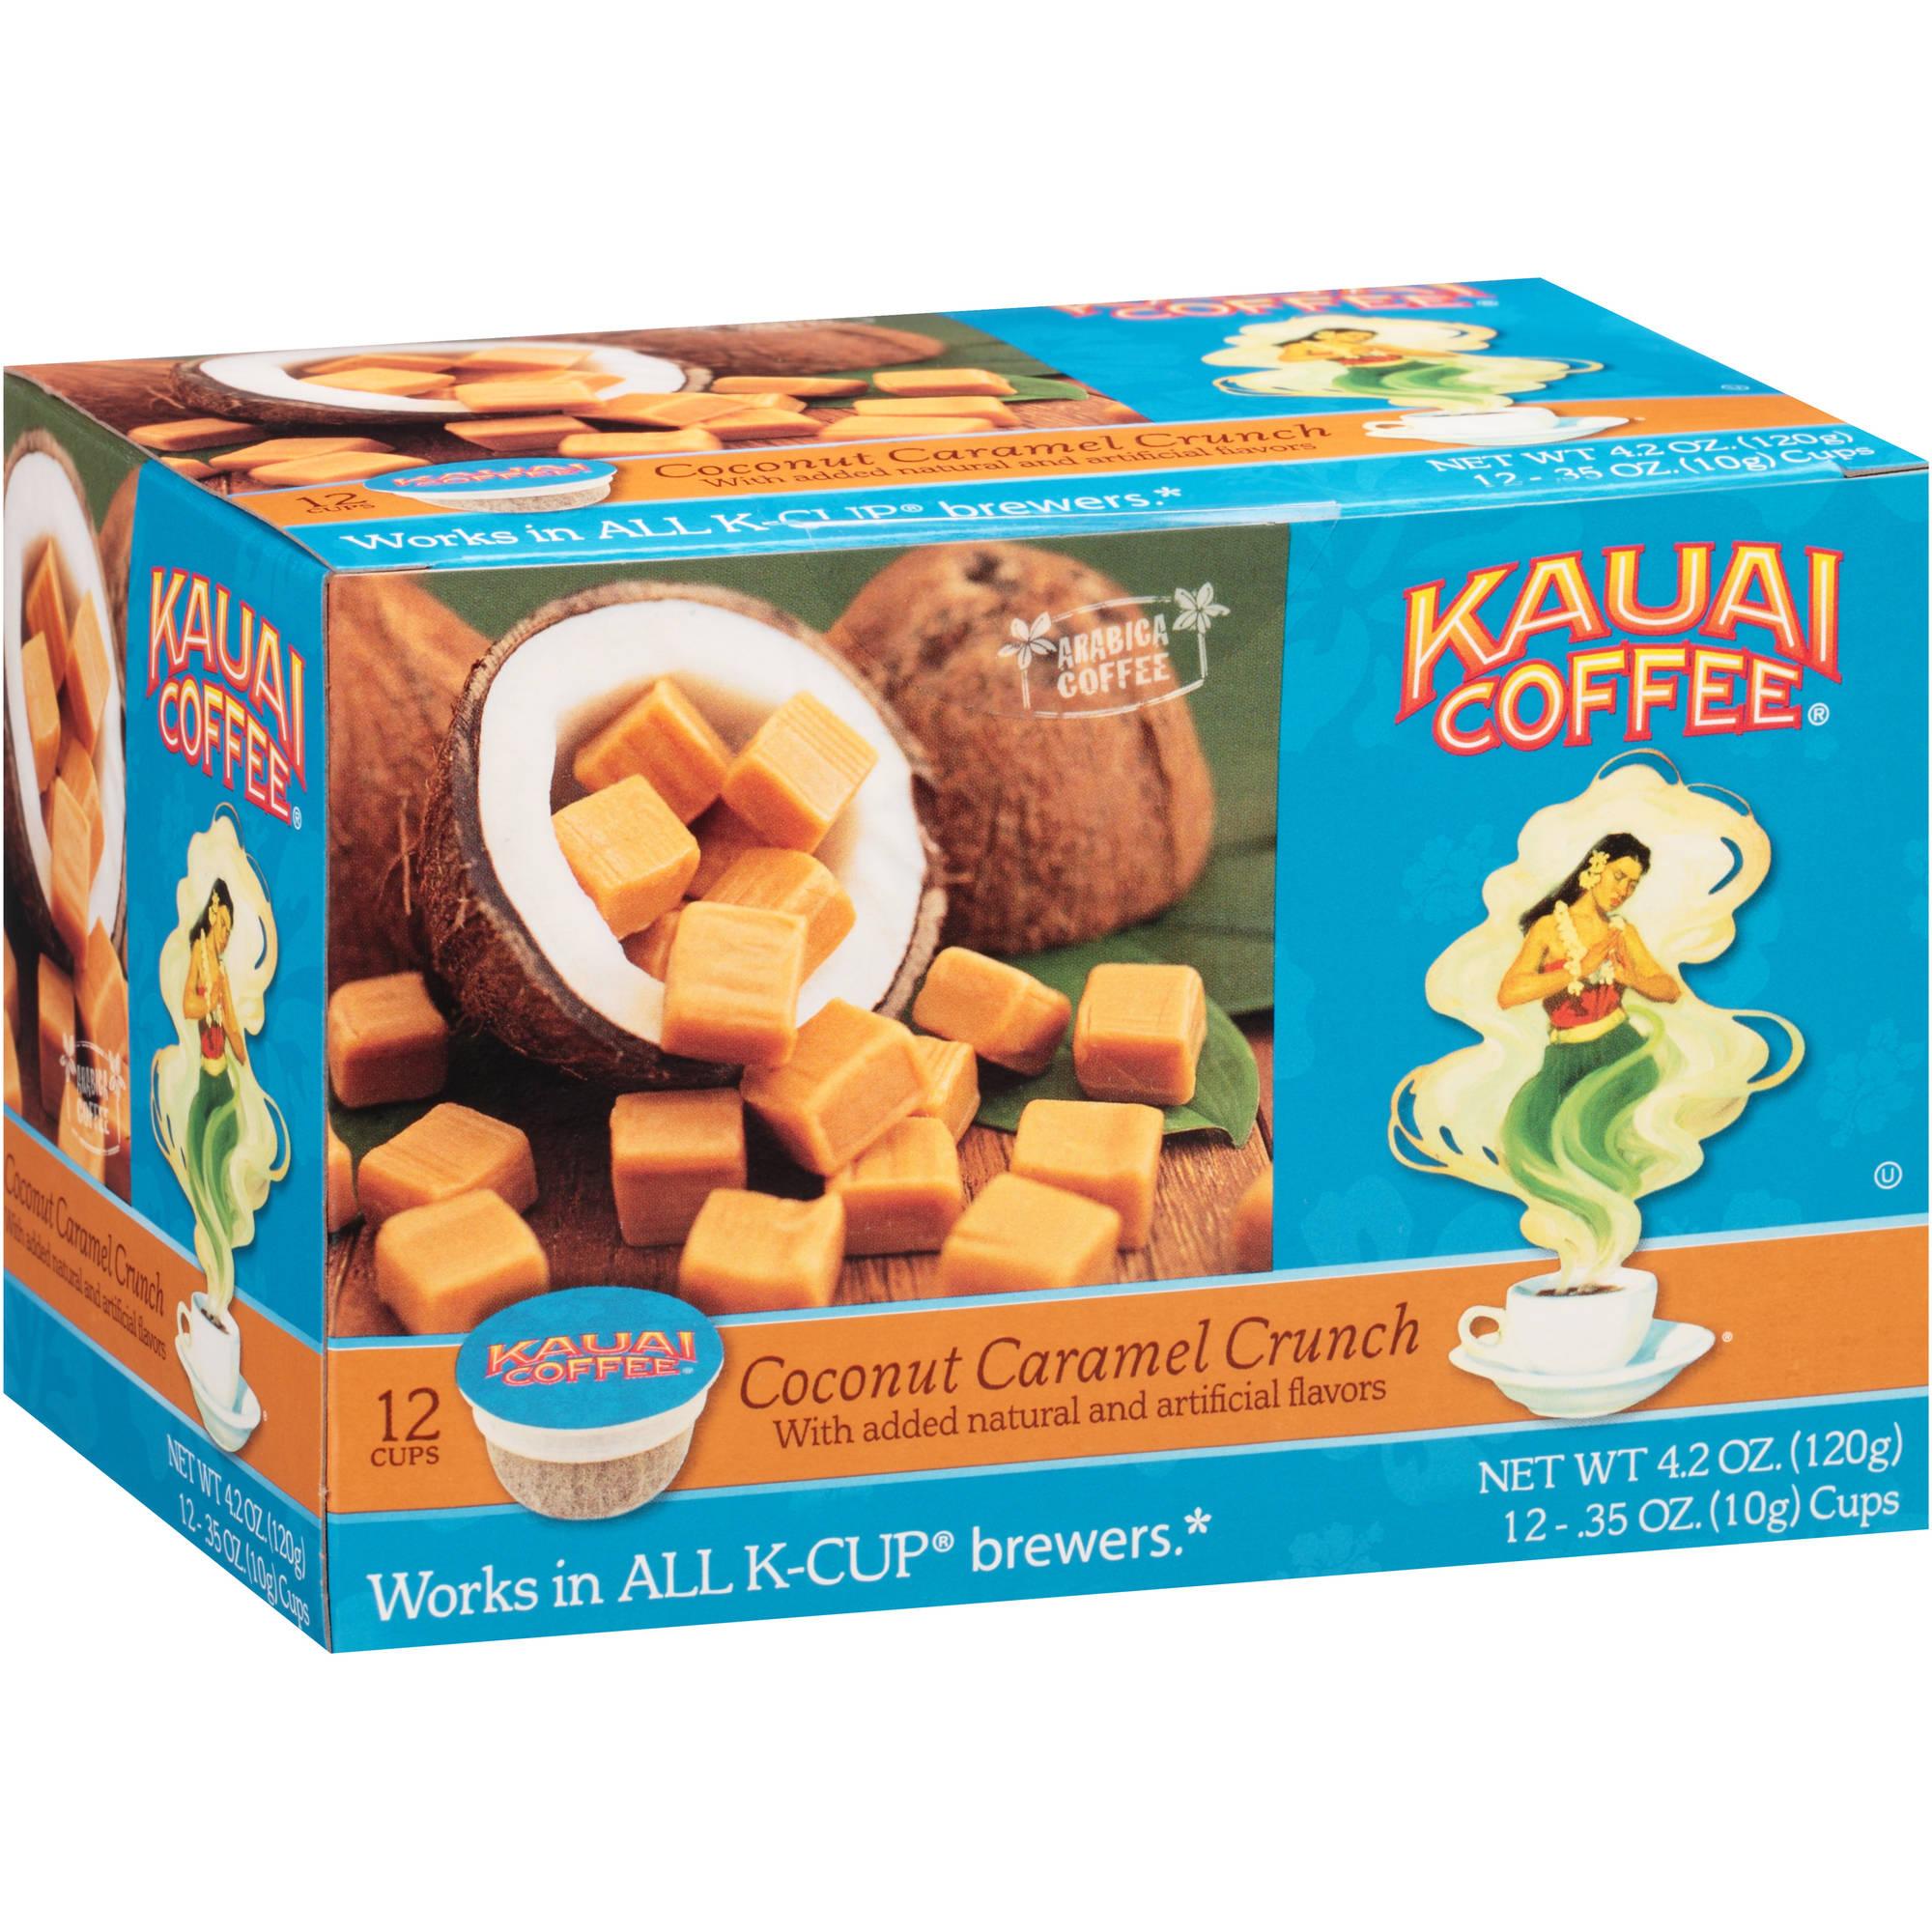 Kauai Coffee Coconut Caramel Crunch Coffee Single Serve Cups, .35 oz, 12 count